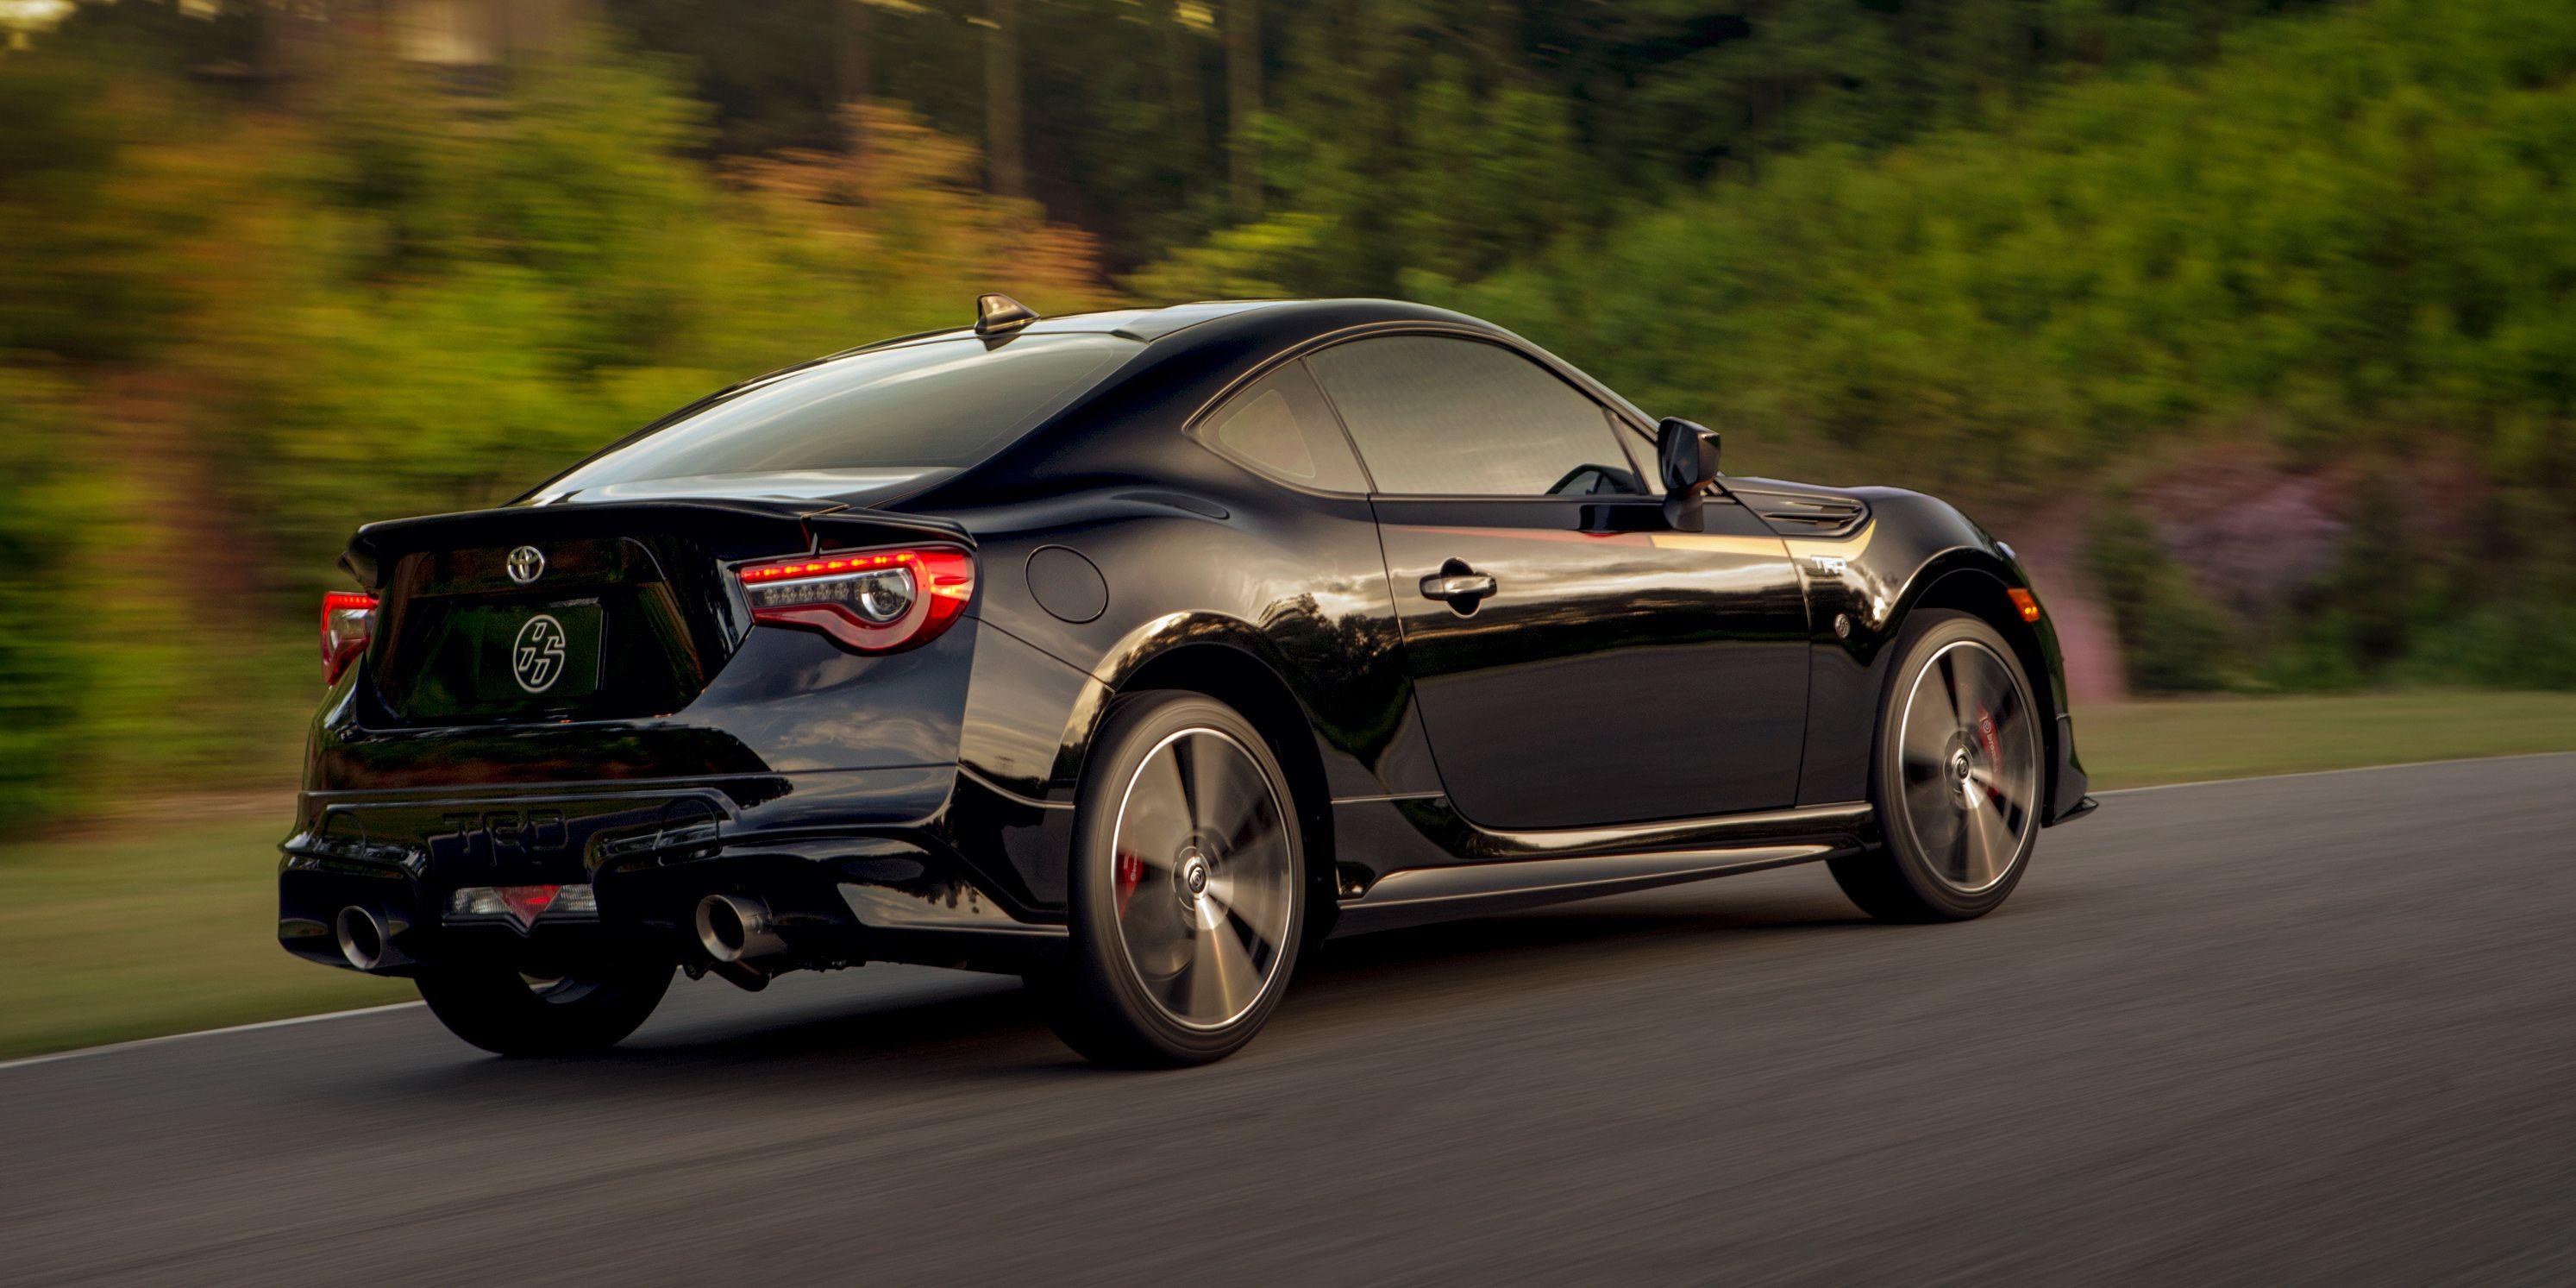 Kekurangan Toyota Gt86 2019 Spesifikasi